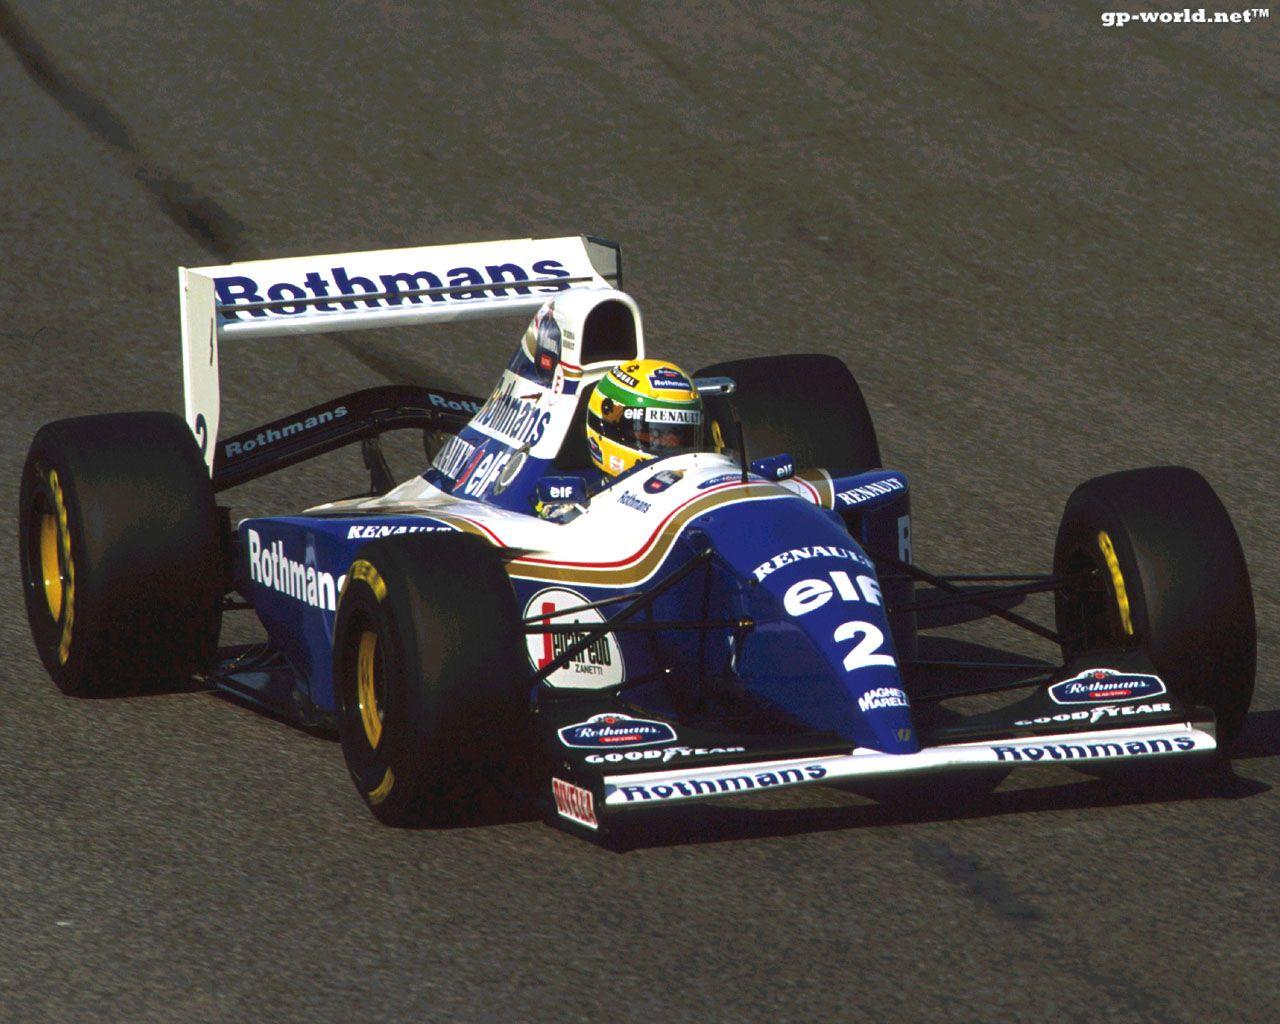 Ayrton Senna Rothmans Car Wallpaper Imola 1994 Ayrton Senna Racing Is In My Blood 1960 1994